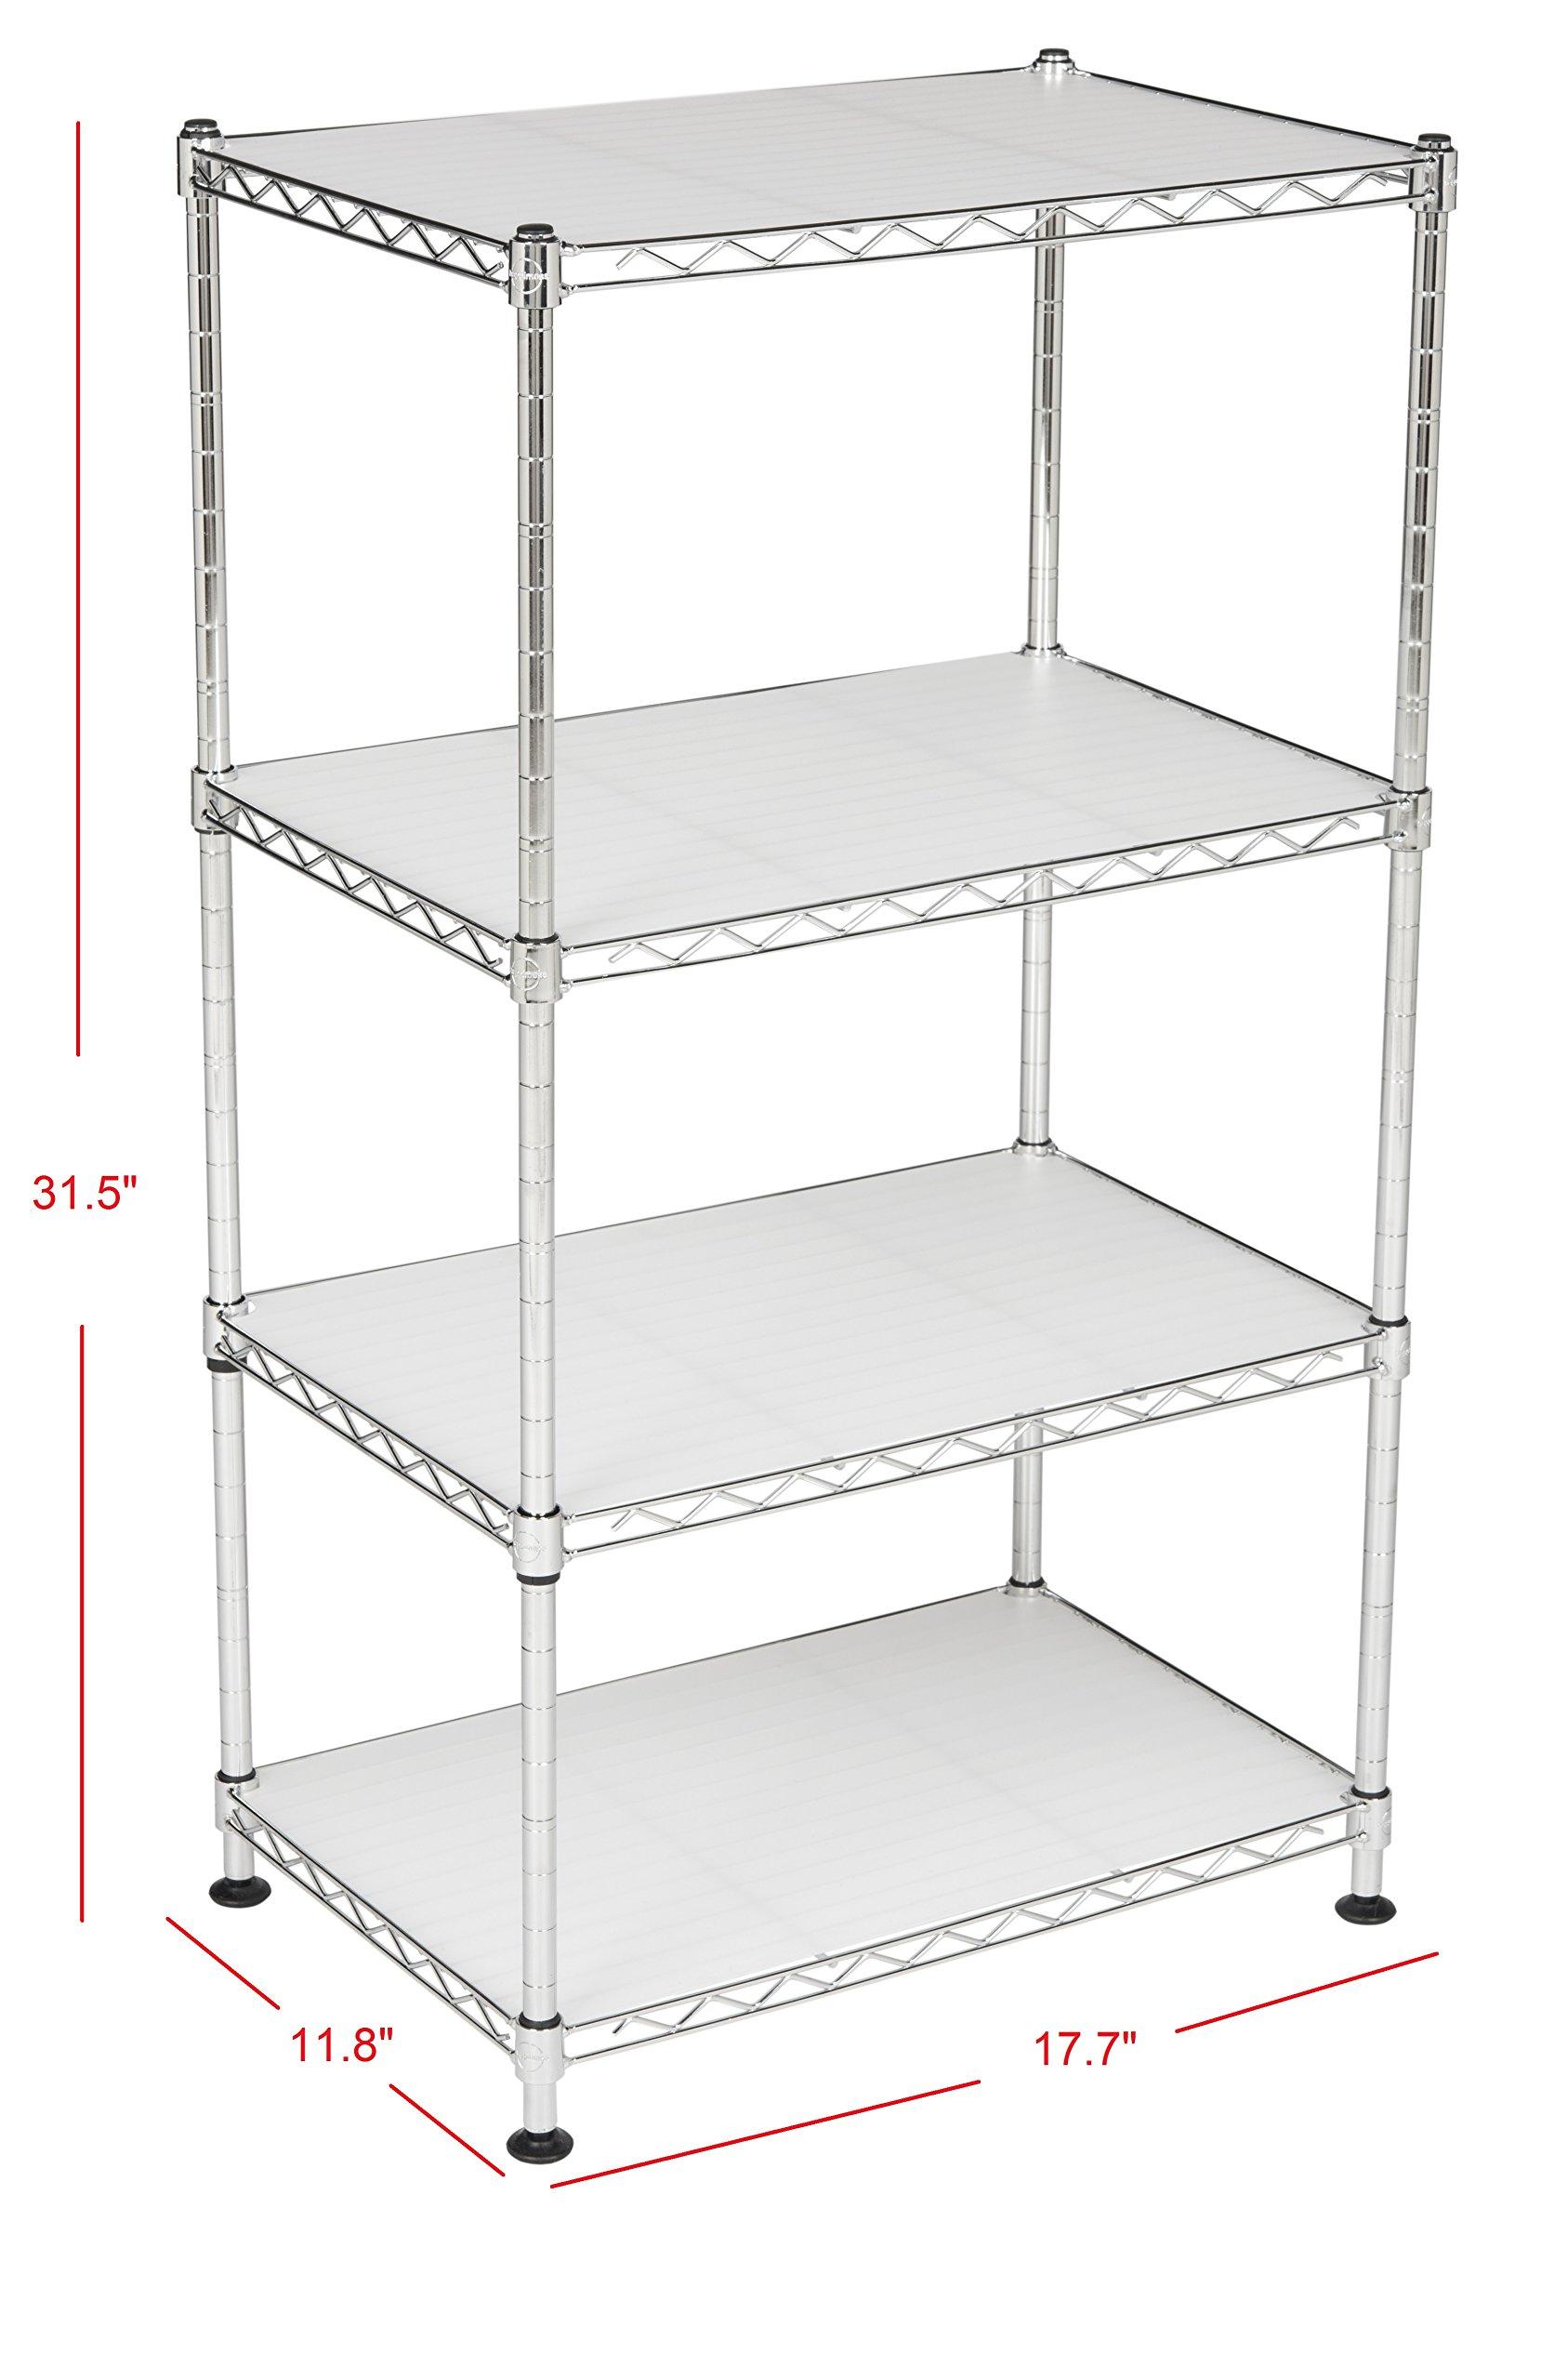 happimess Hope 31.5'' 4-Tier Adjustable Baker's Rack, Chrome by happimess (Image #6)